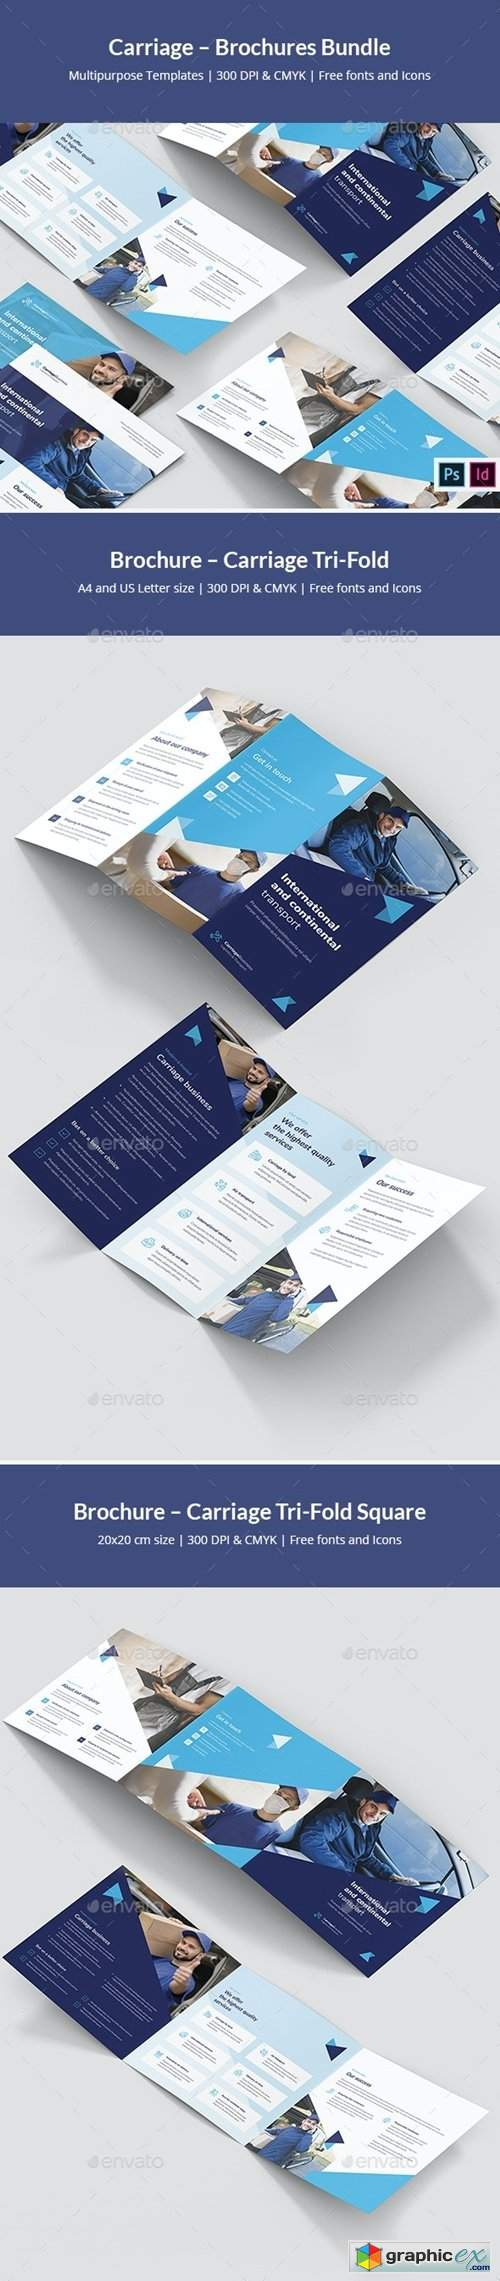 Carriage – Brochures Bundle Print Templates 7 in 1